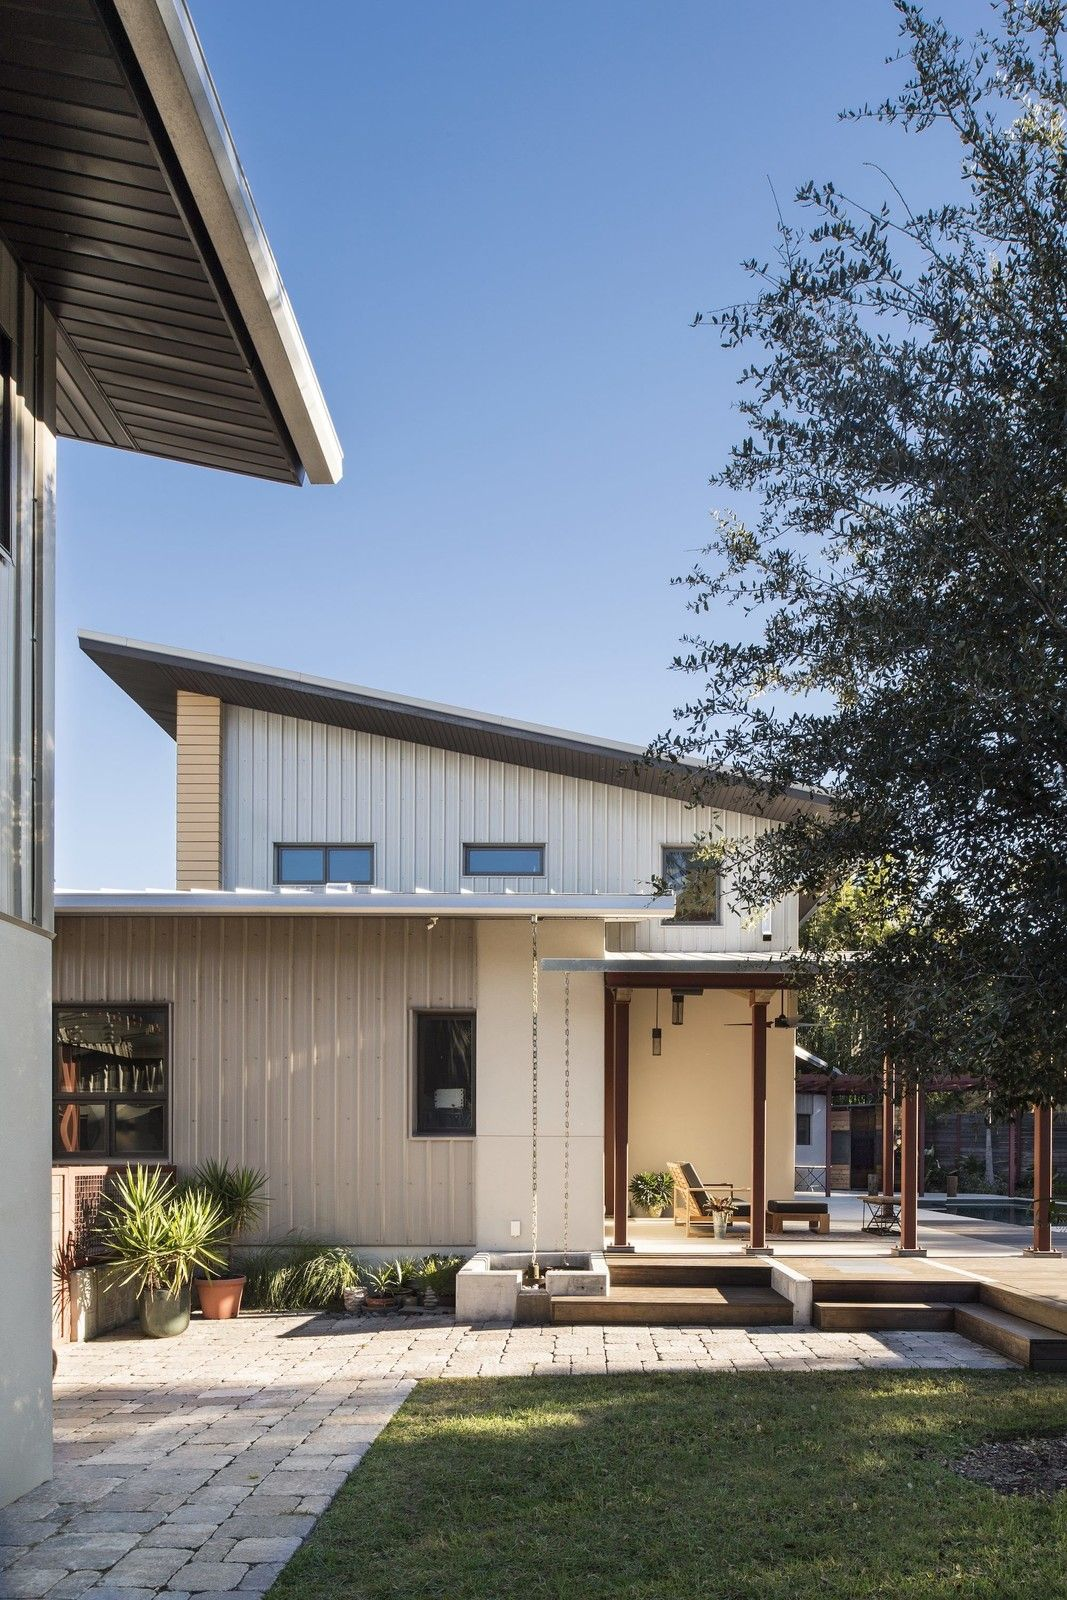 Lakeside Collection Patio Furniture: 1600 Lakeside Modern Home In Orlando, Florida